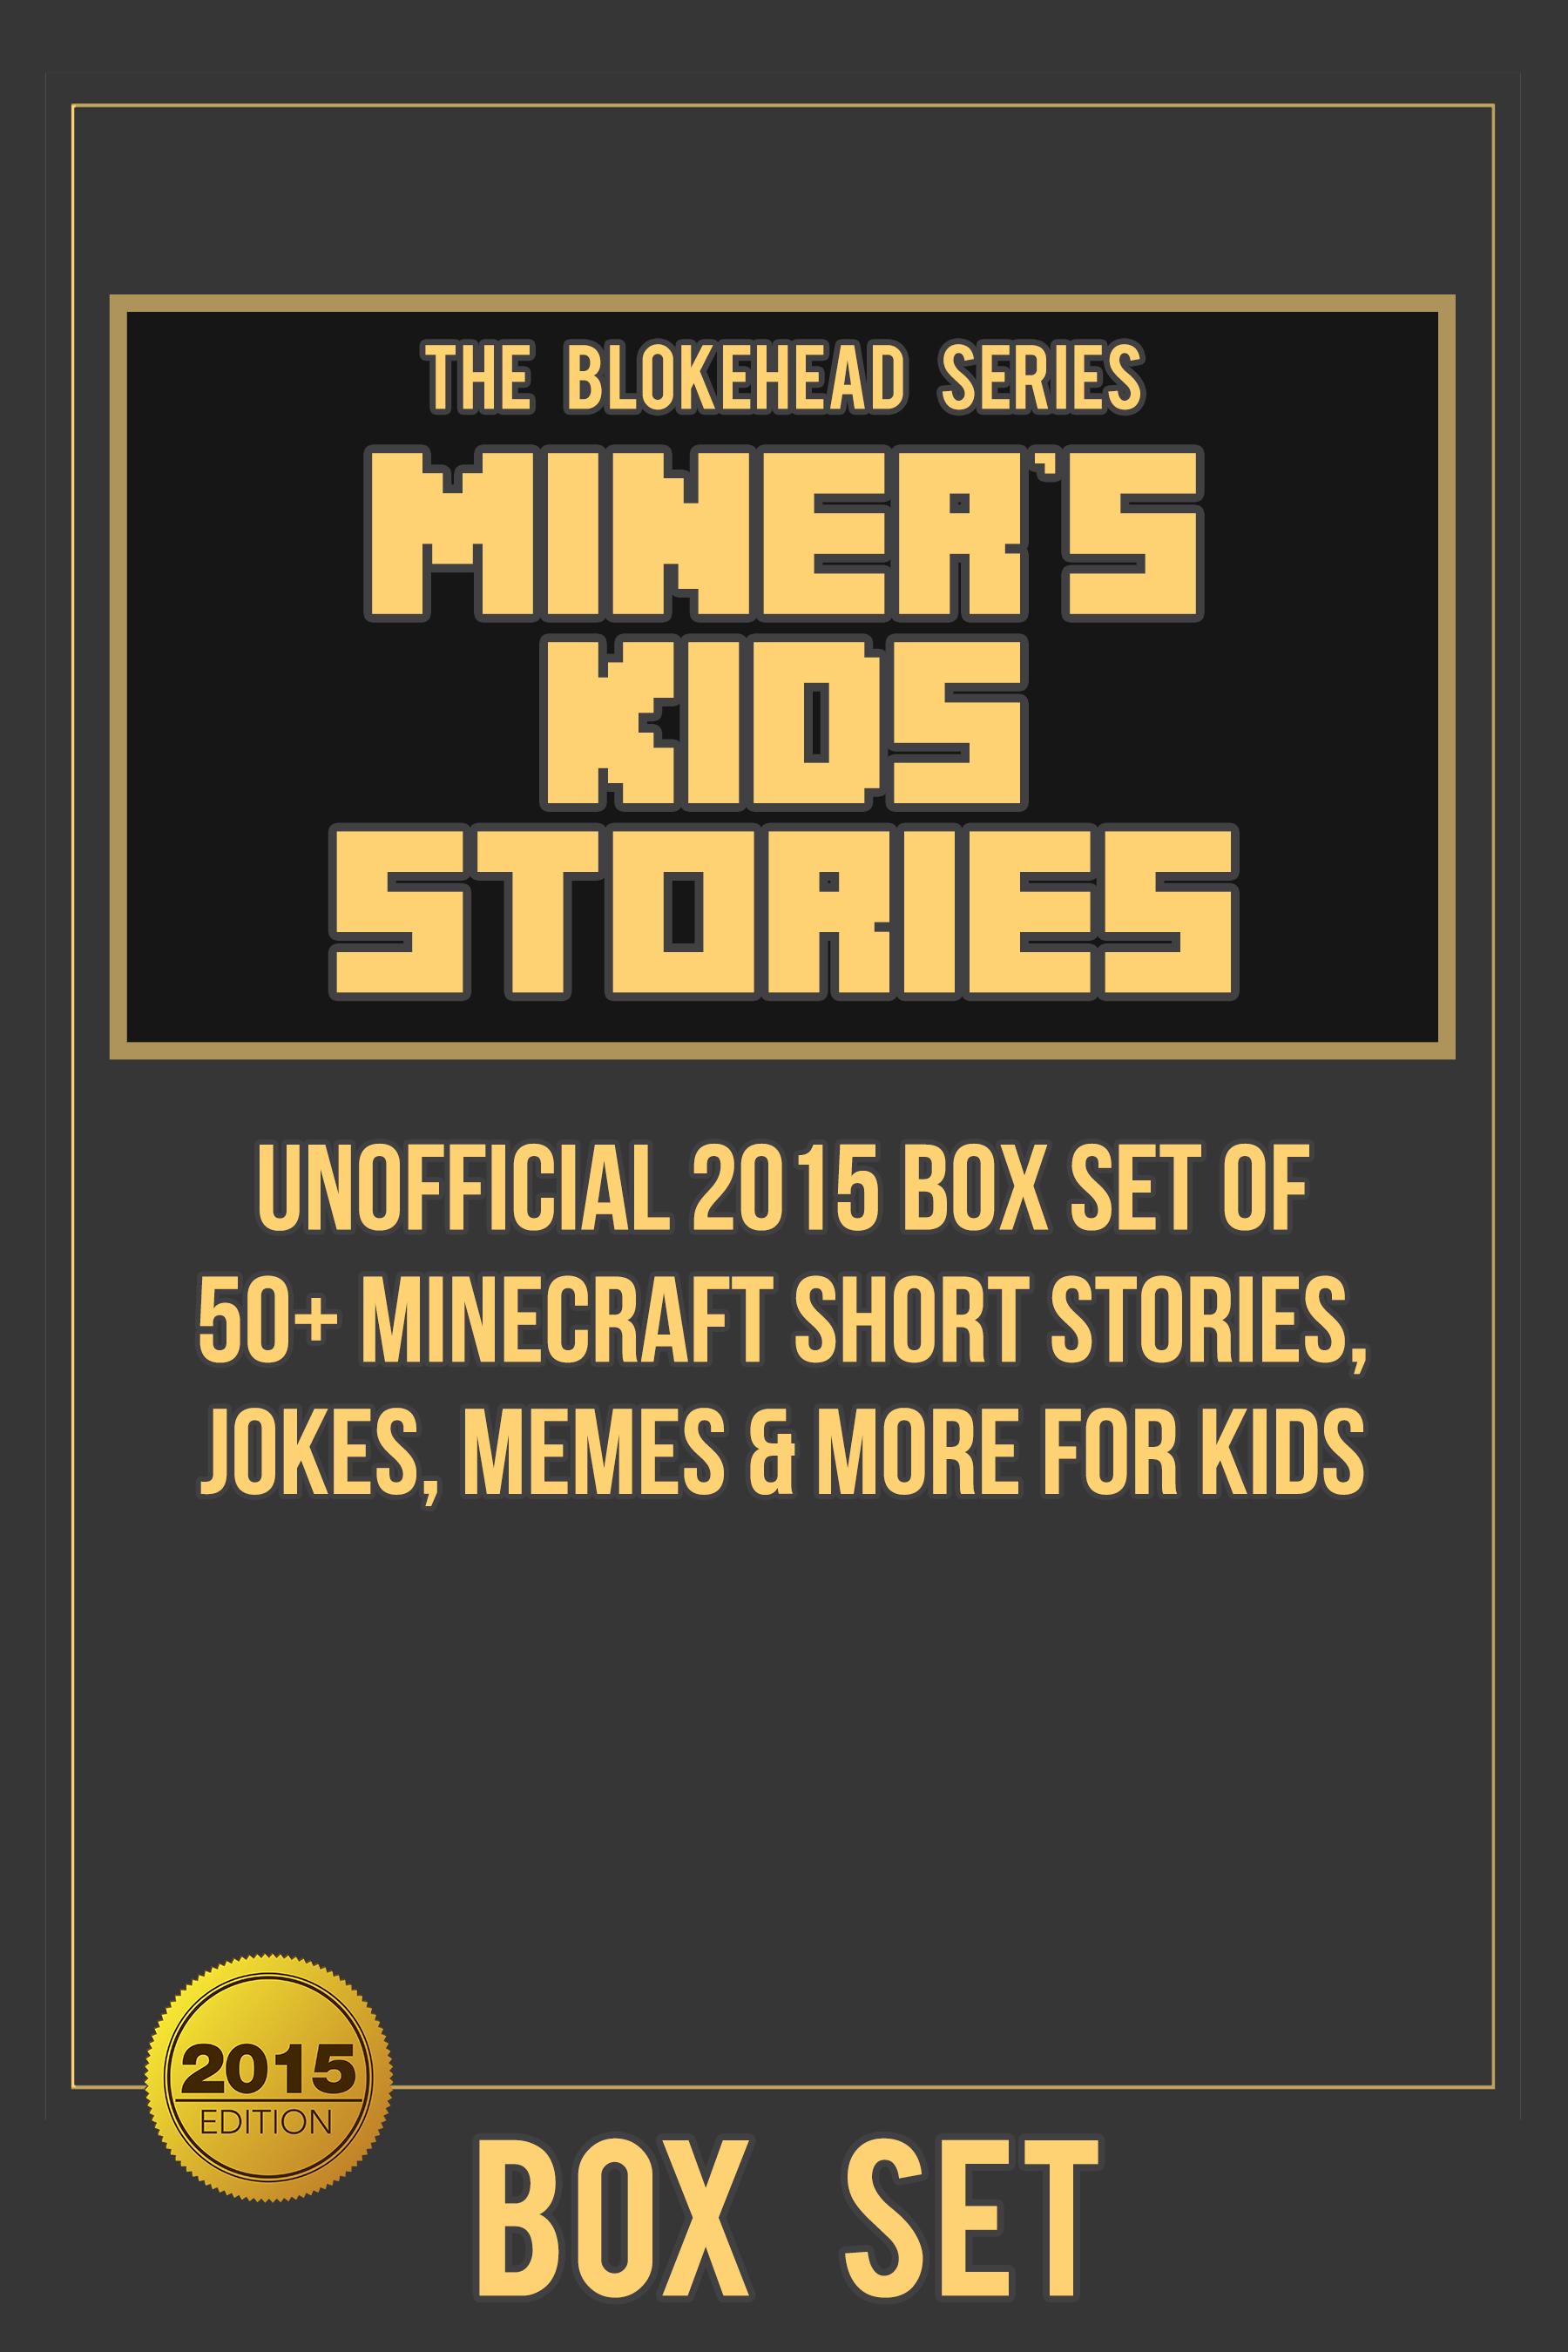 Miner's kids stories: unofficial 2015 box set of 50+ minecraft short stories, jokes for kids